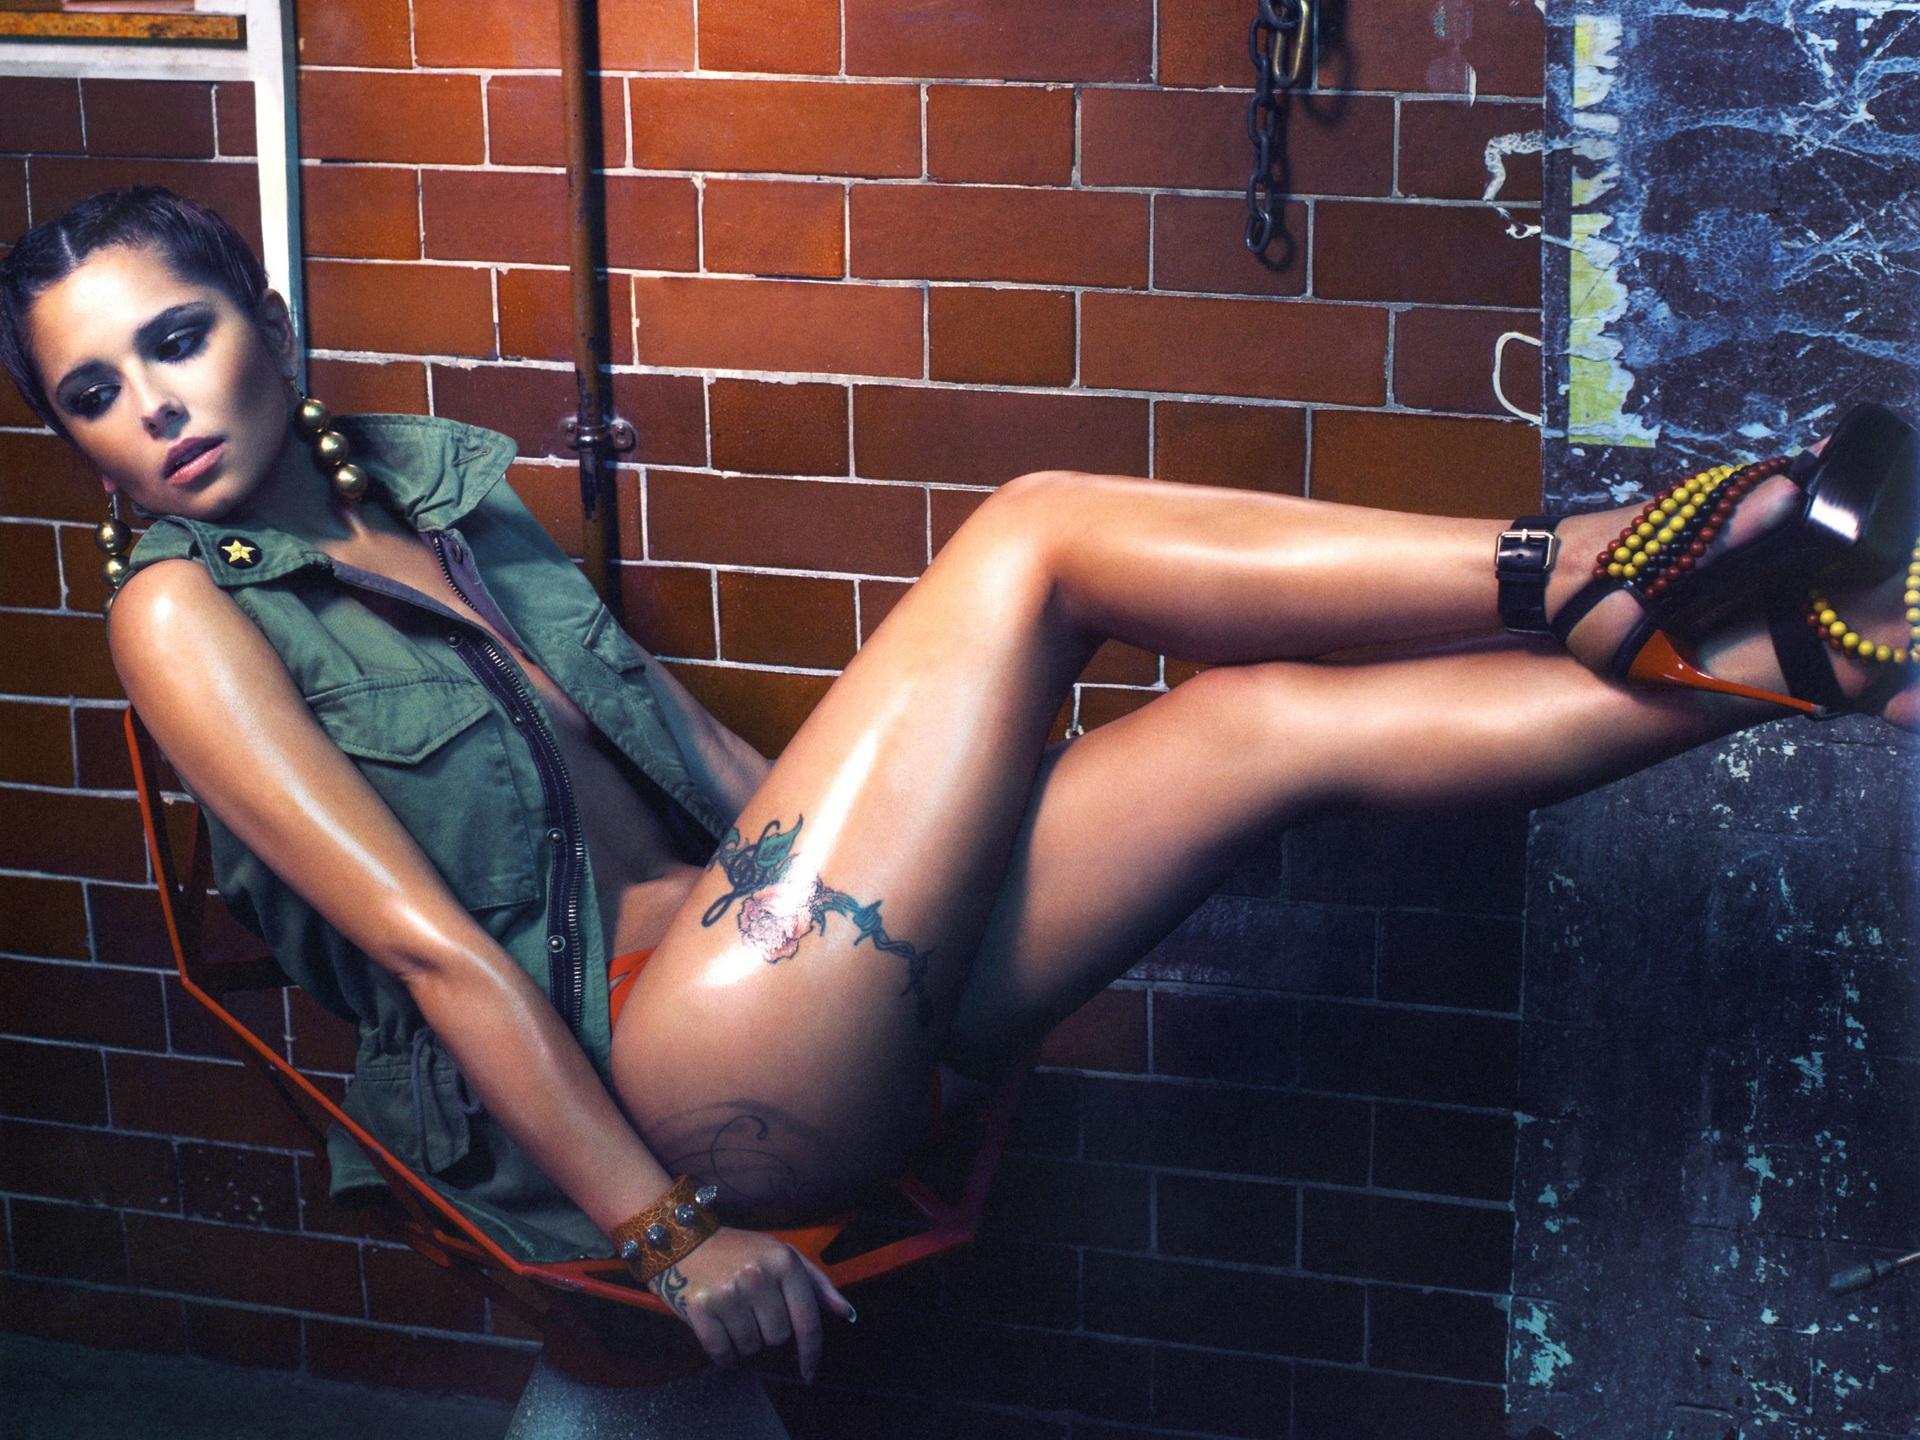 Cheryl Cole watkykjy warm bokkie